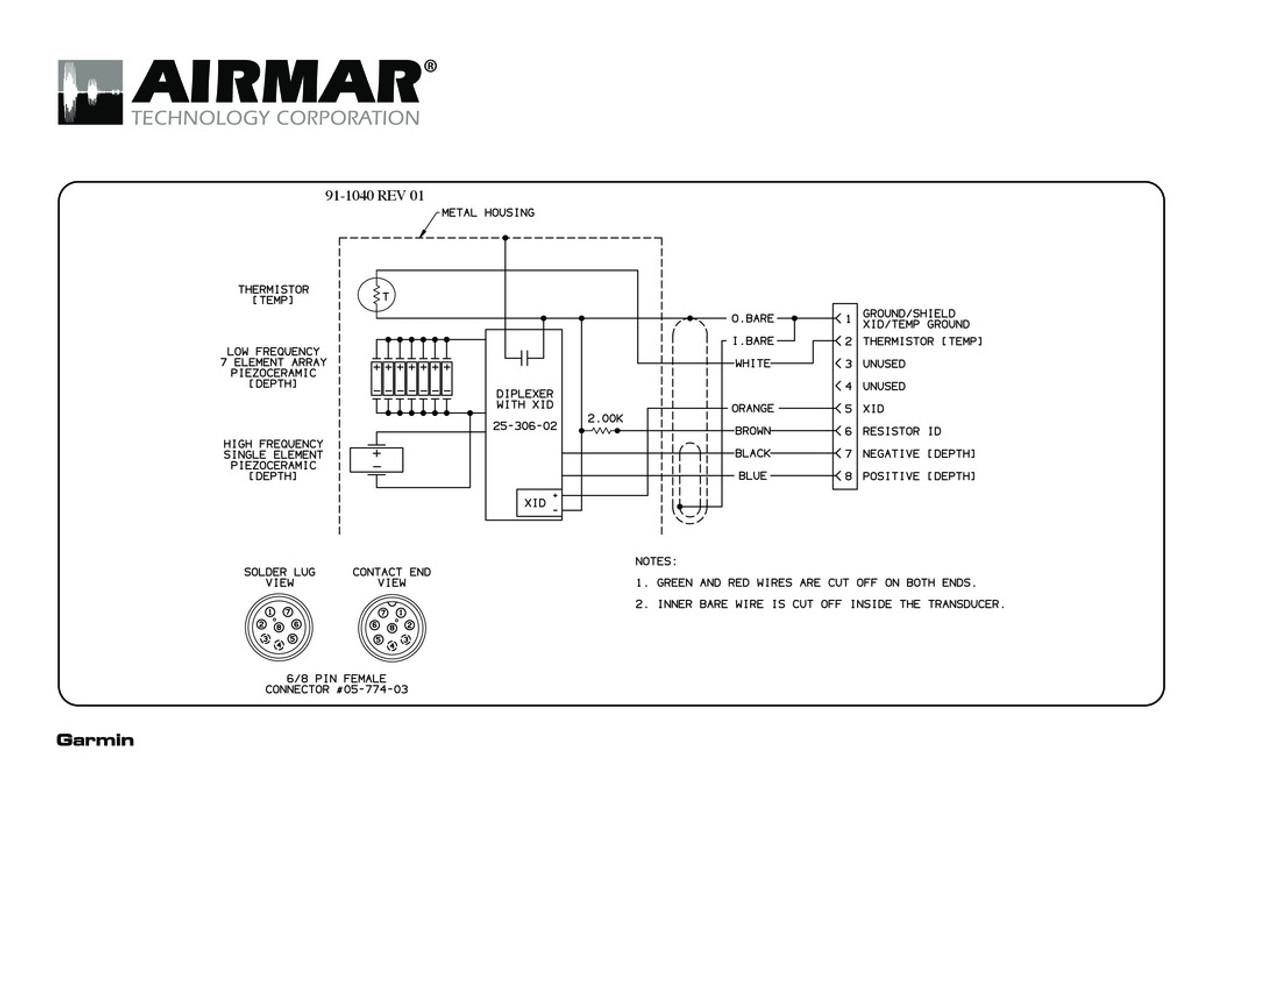 garmin 196 gp wiring diagram [ 1100 x 850 Pixel ]